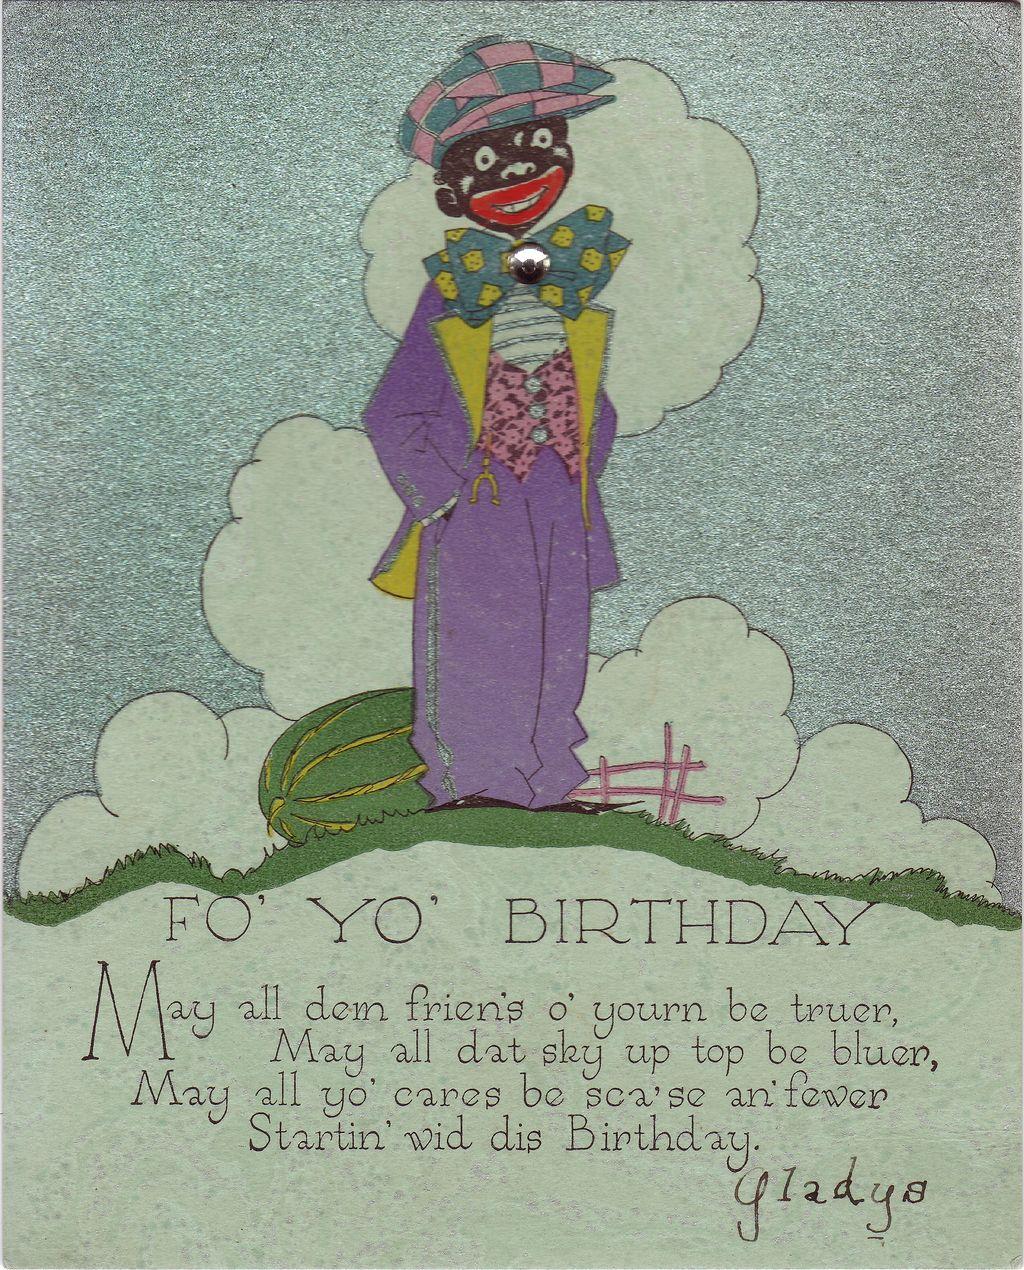 Art Deco Novelty Birthday Card Circa 1932 from decosurfnrl on – Novelty Birthday Cards